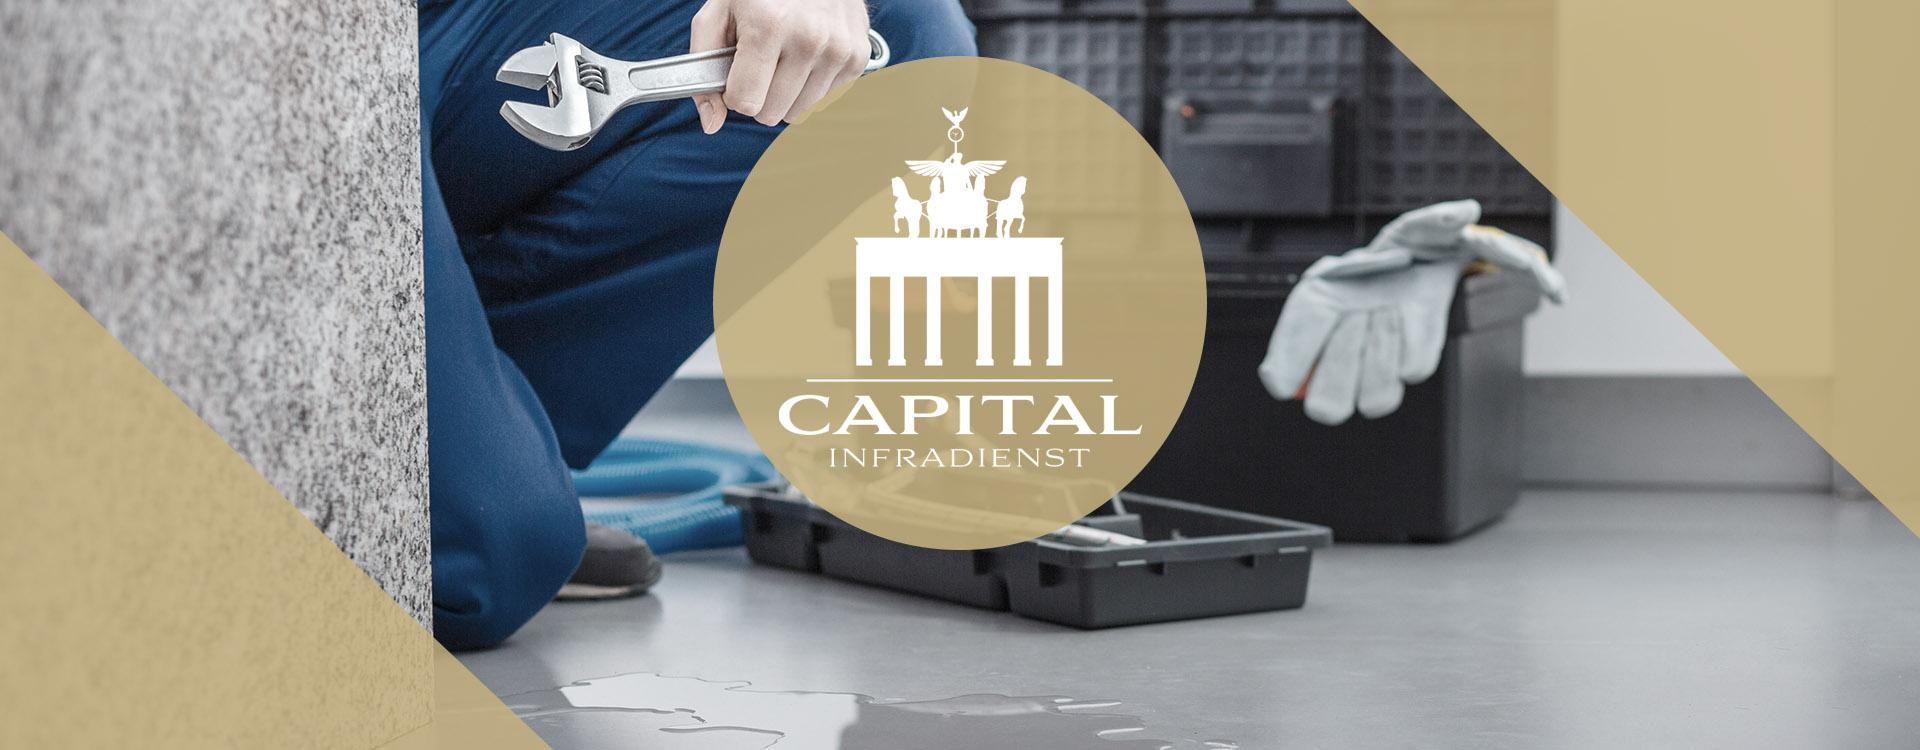 capital-infradienst-slider-sanitaer-notdienst